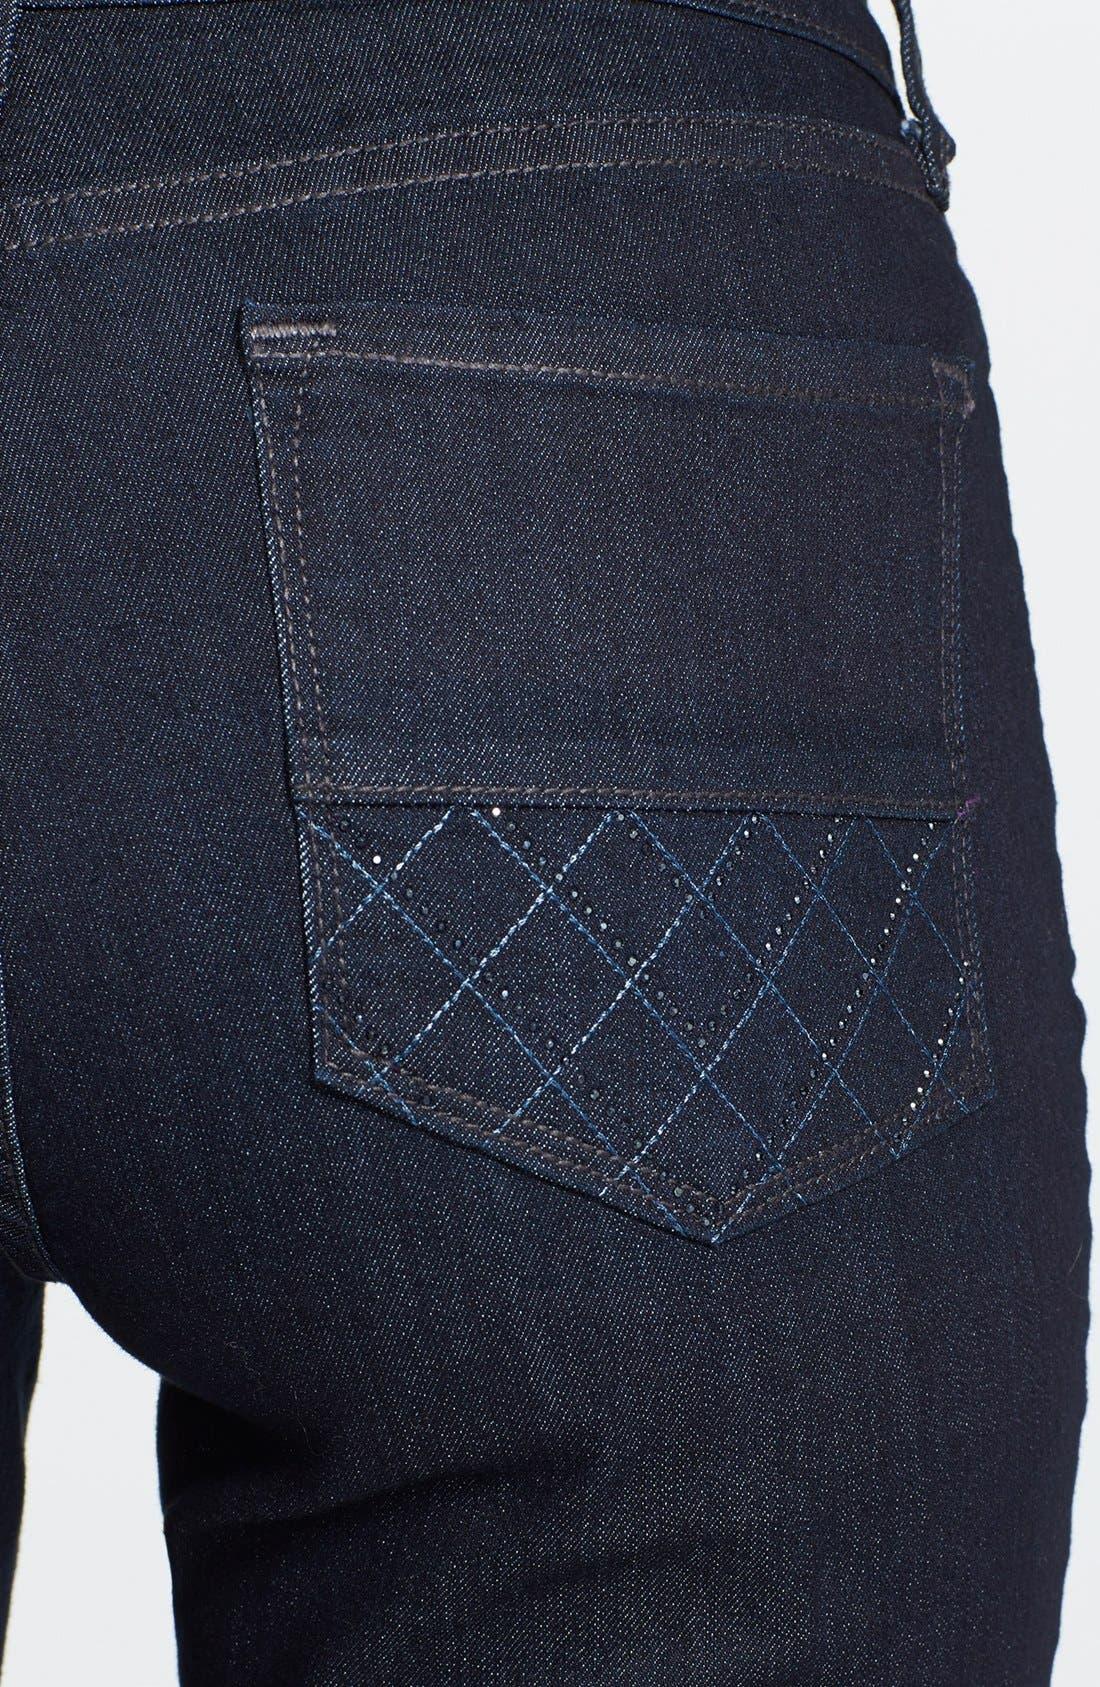 Alternate Image 3  - NYDJ 'Marilyn' Straight Leg Jeans (Dark Enzyme) (Petite)